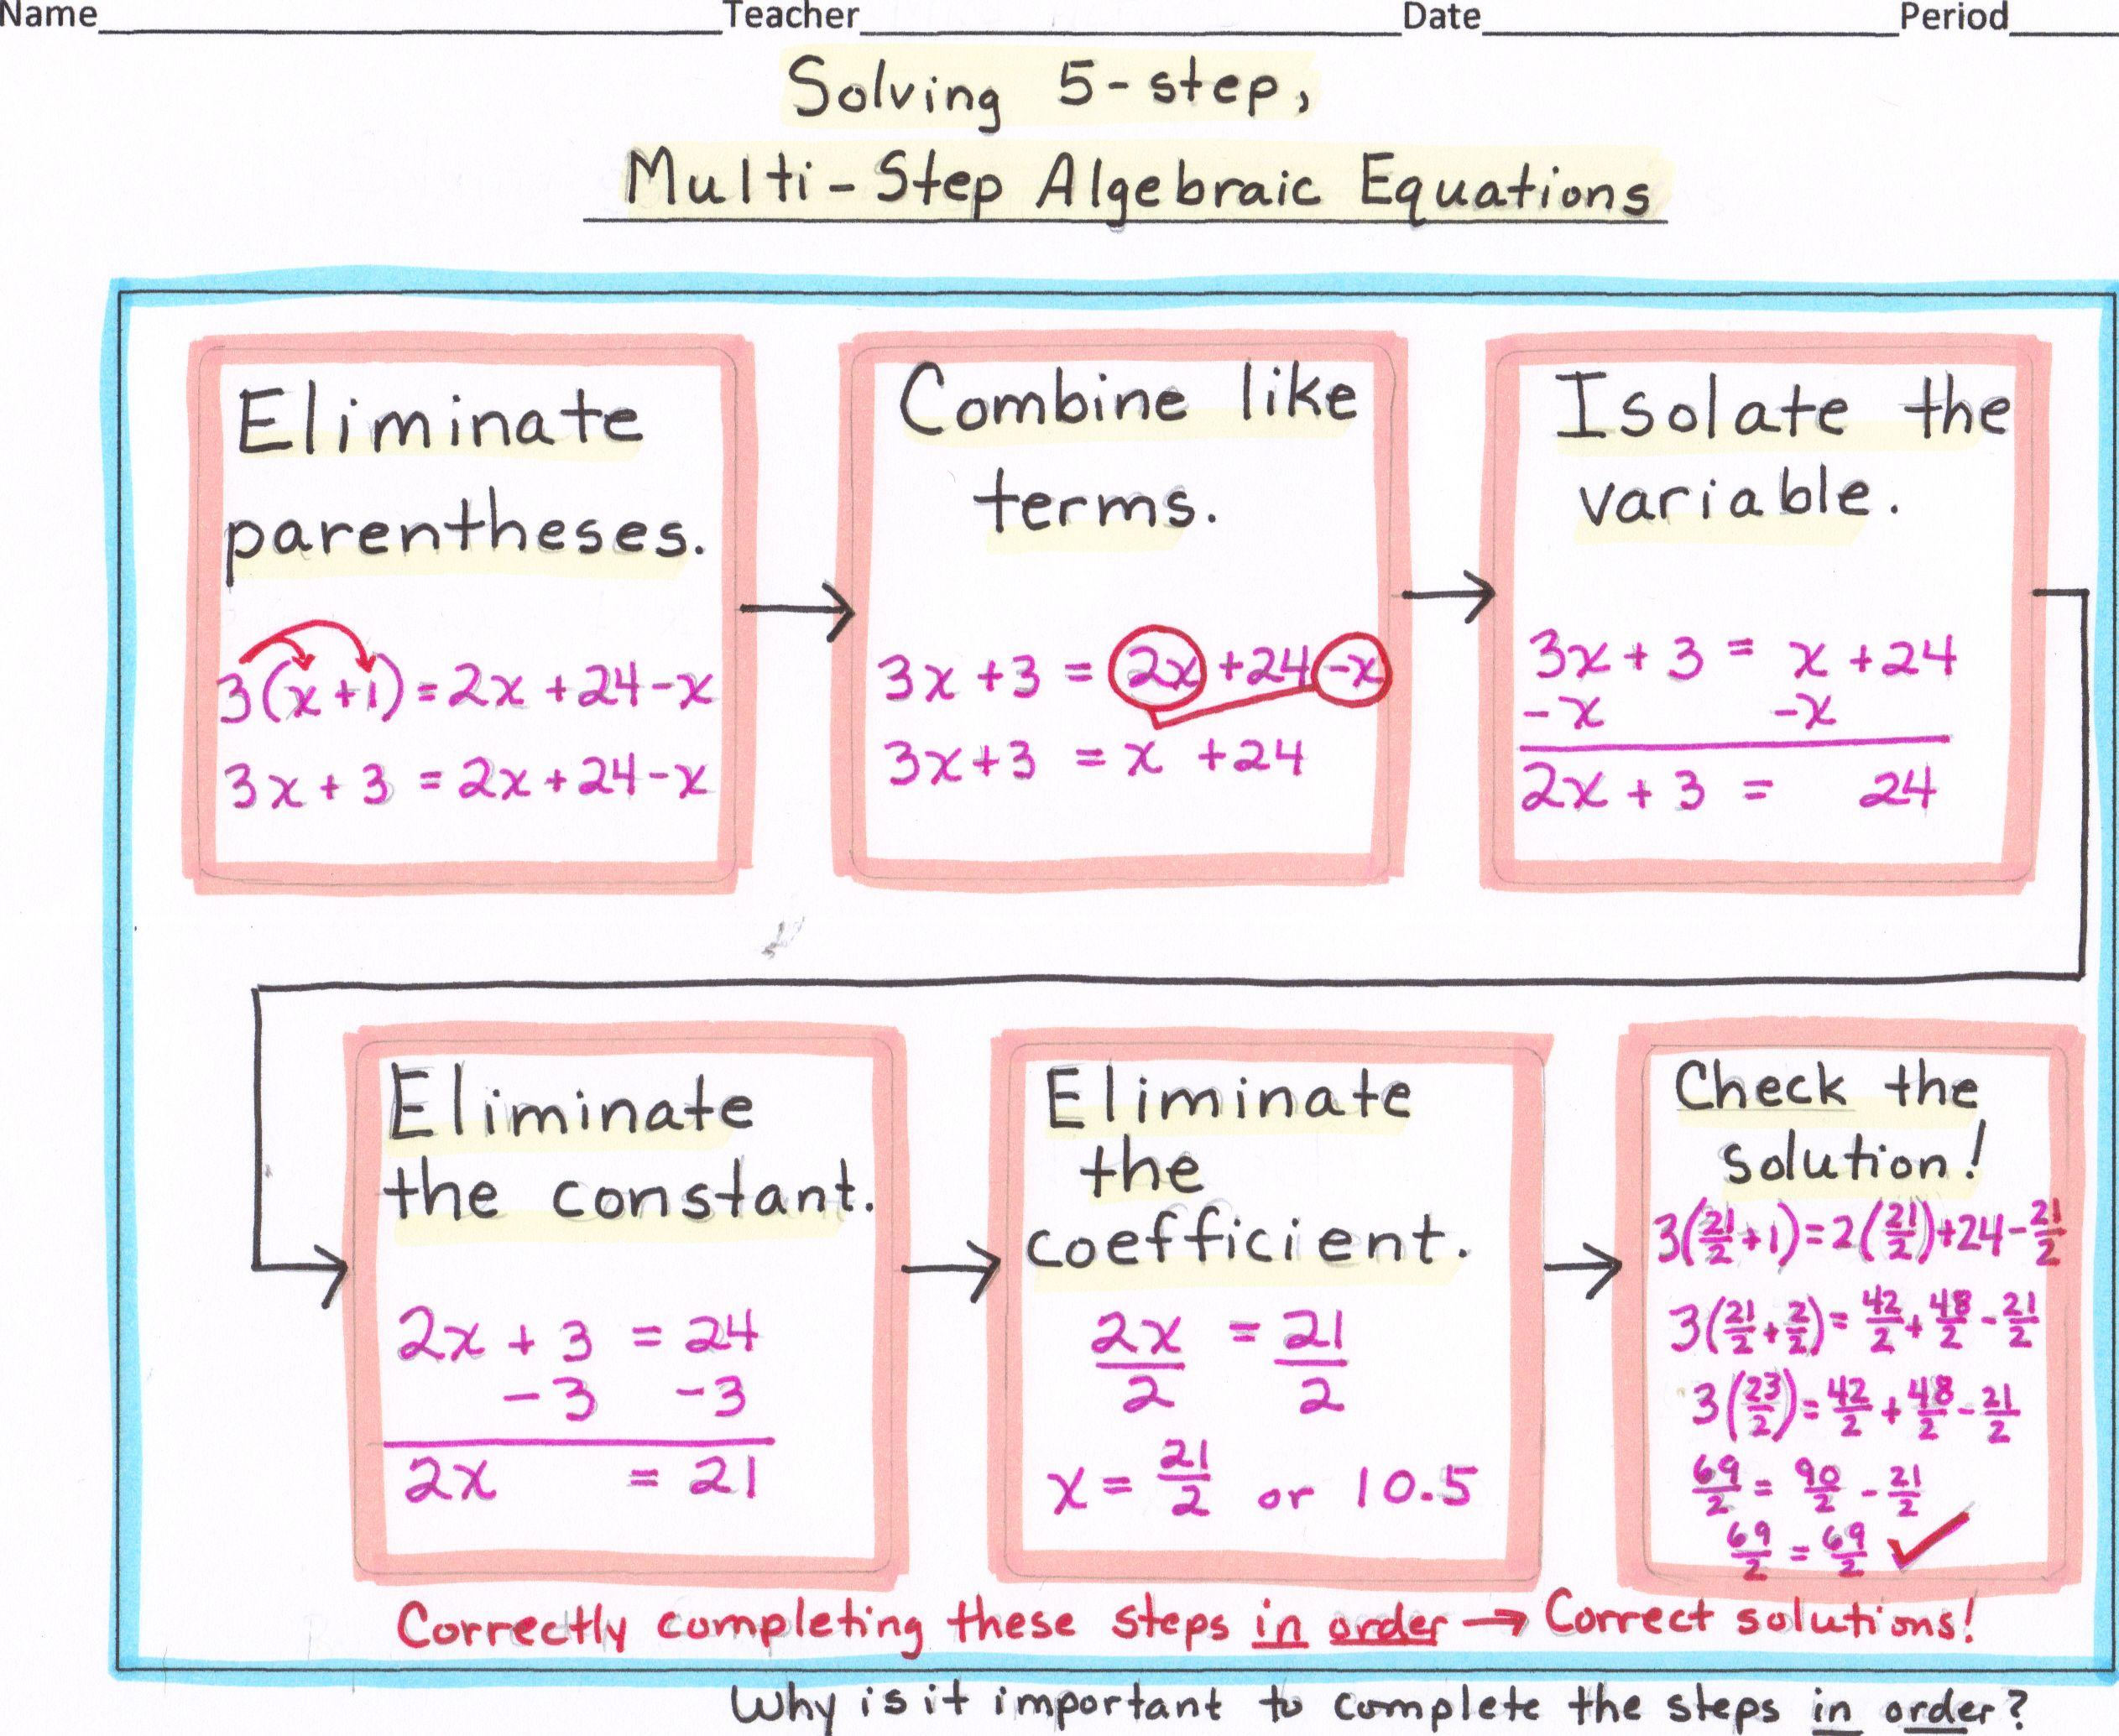 Math Algebra Flow Map Solving Multi Step Algebraic Equations In 2020 Algebra Equations Equations Solving Equations